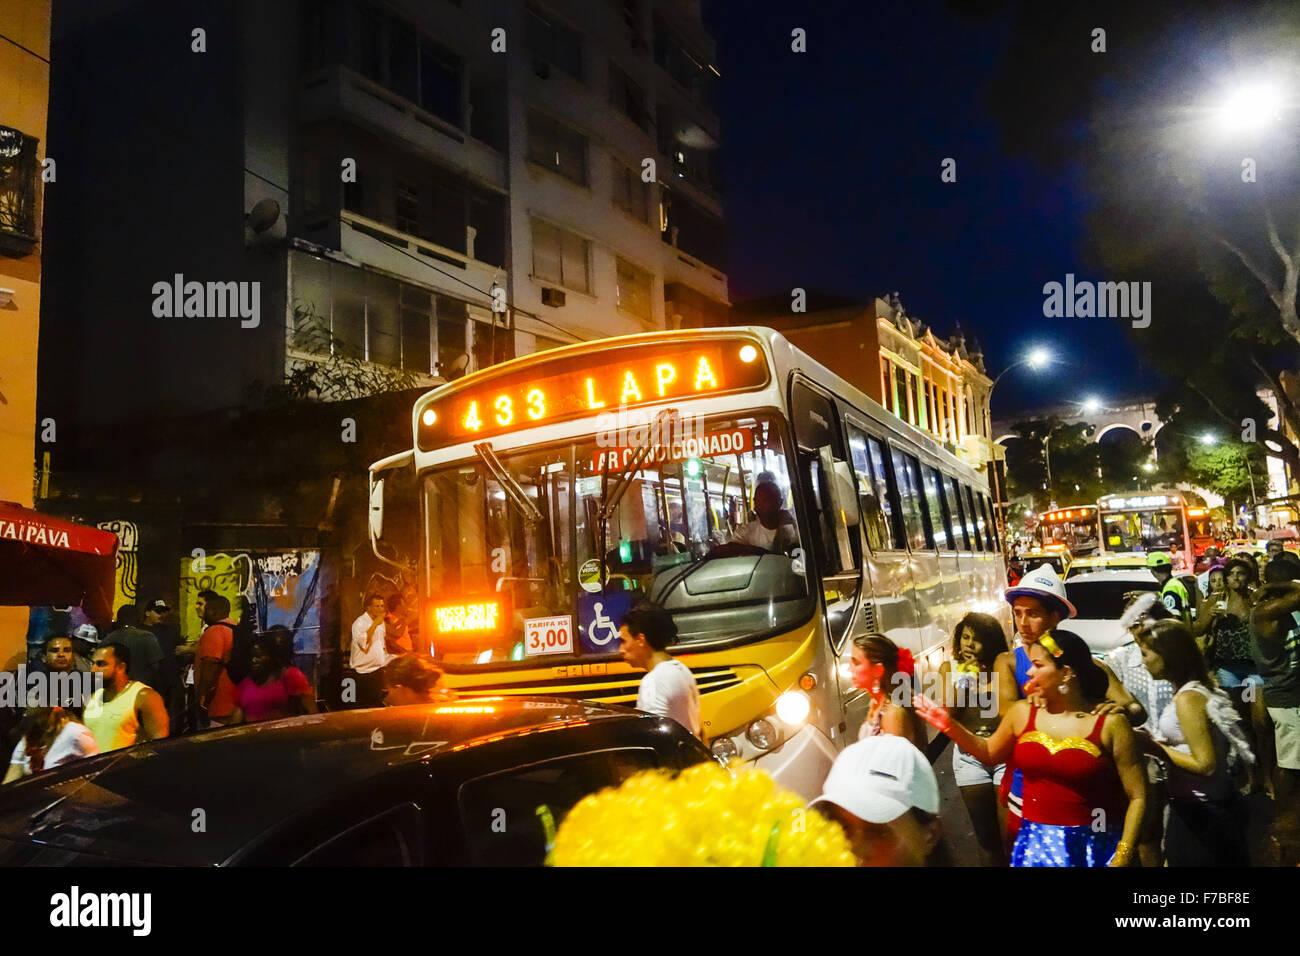 Rio de Janeiro, Lapa, strada di carnevale, Brasile Immagini Stock